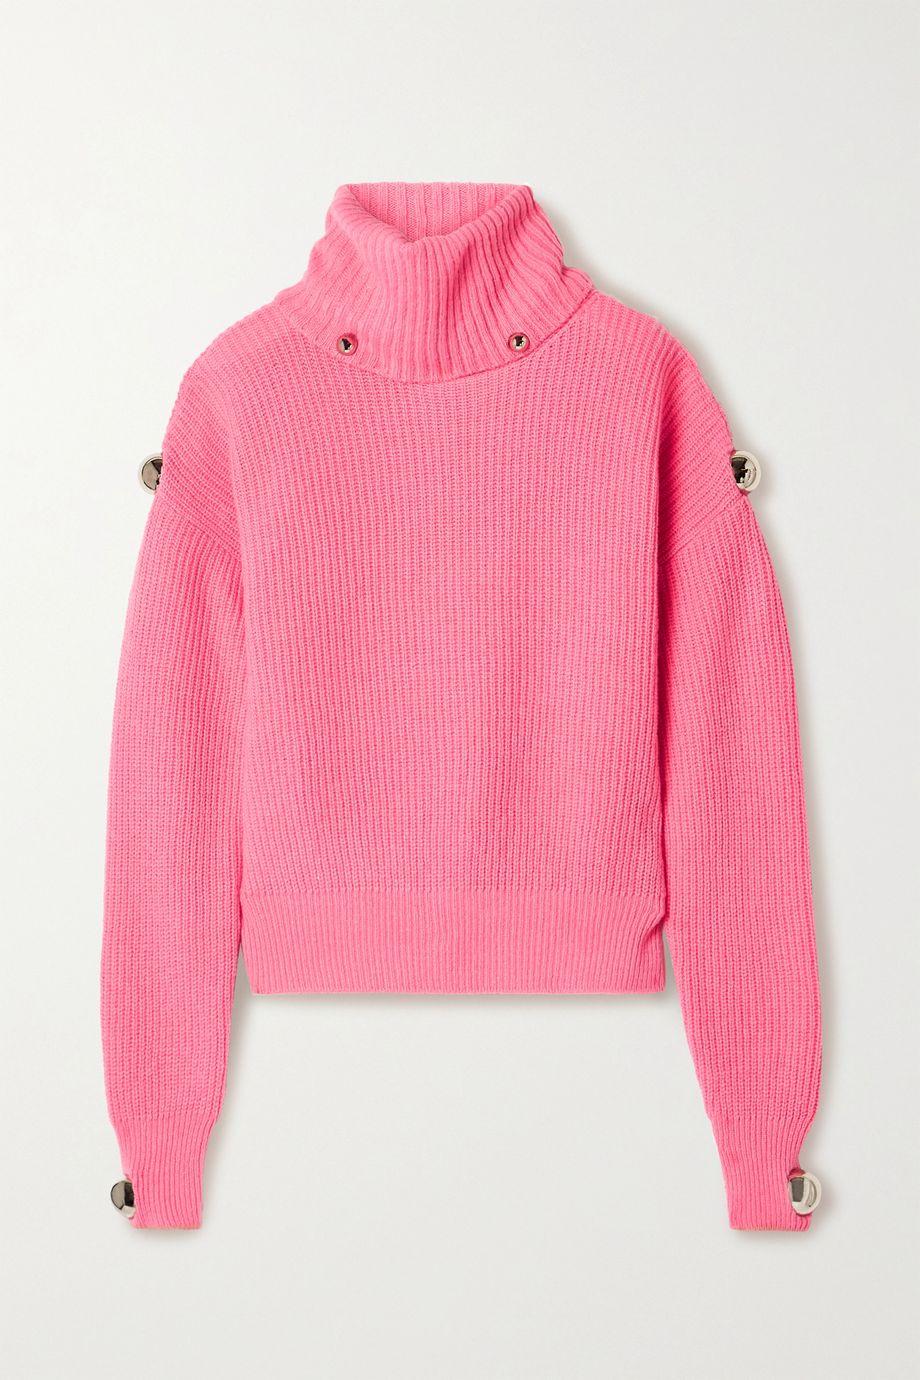 Christopher Kane Dome embellished ribbed wool turtleneck sweater